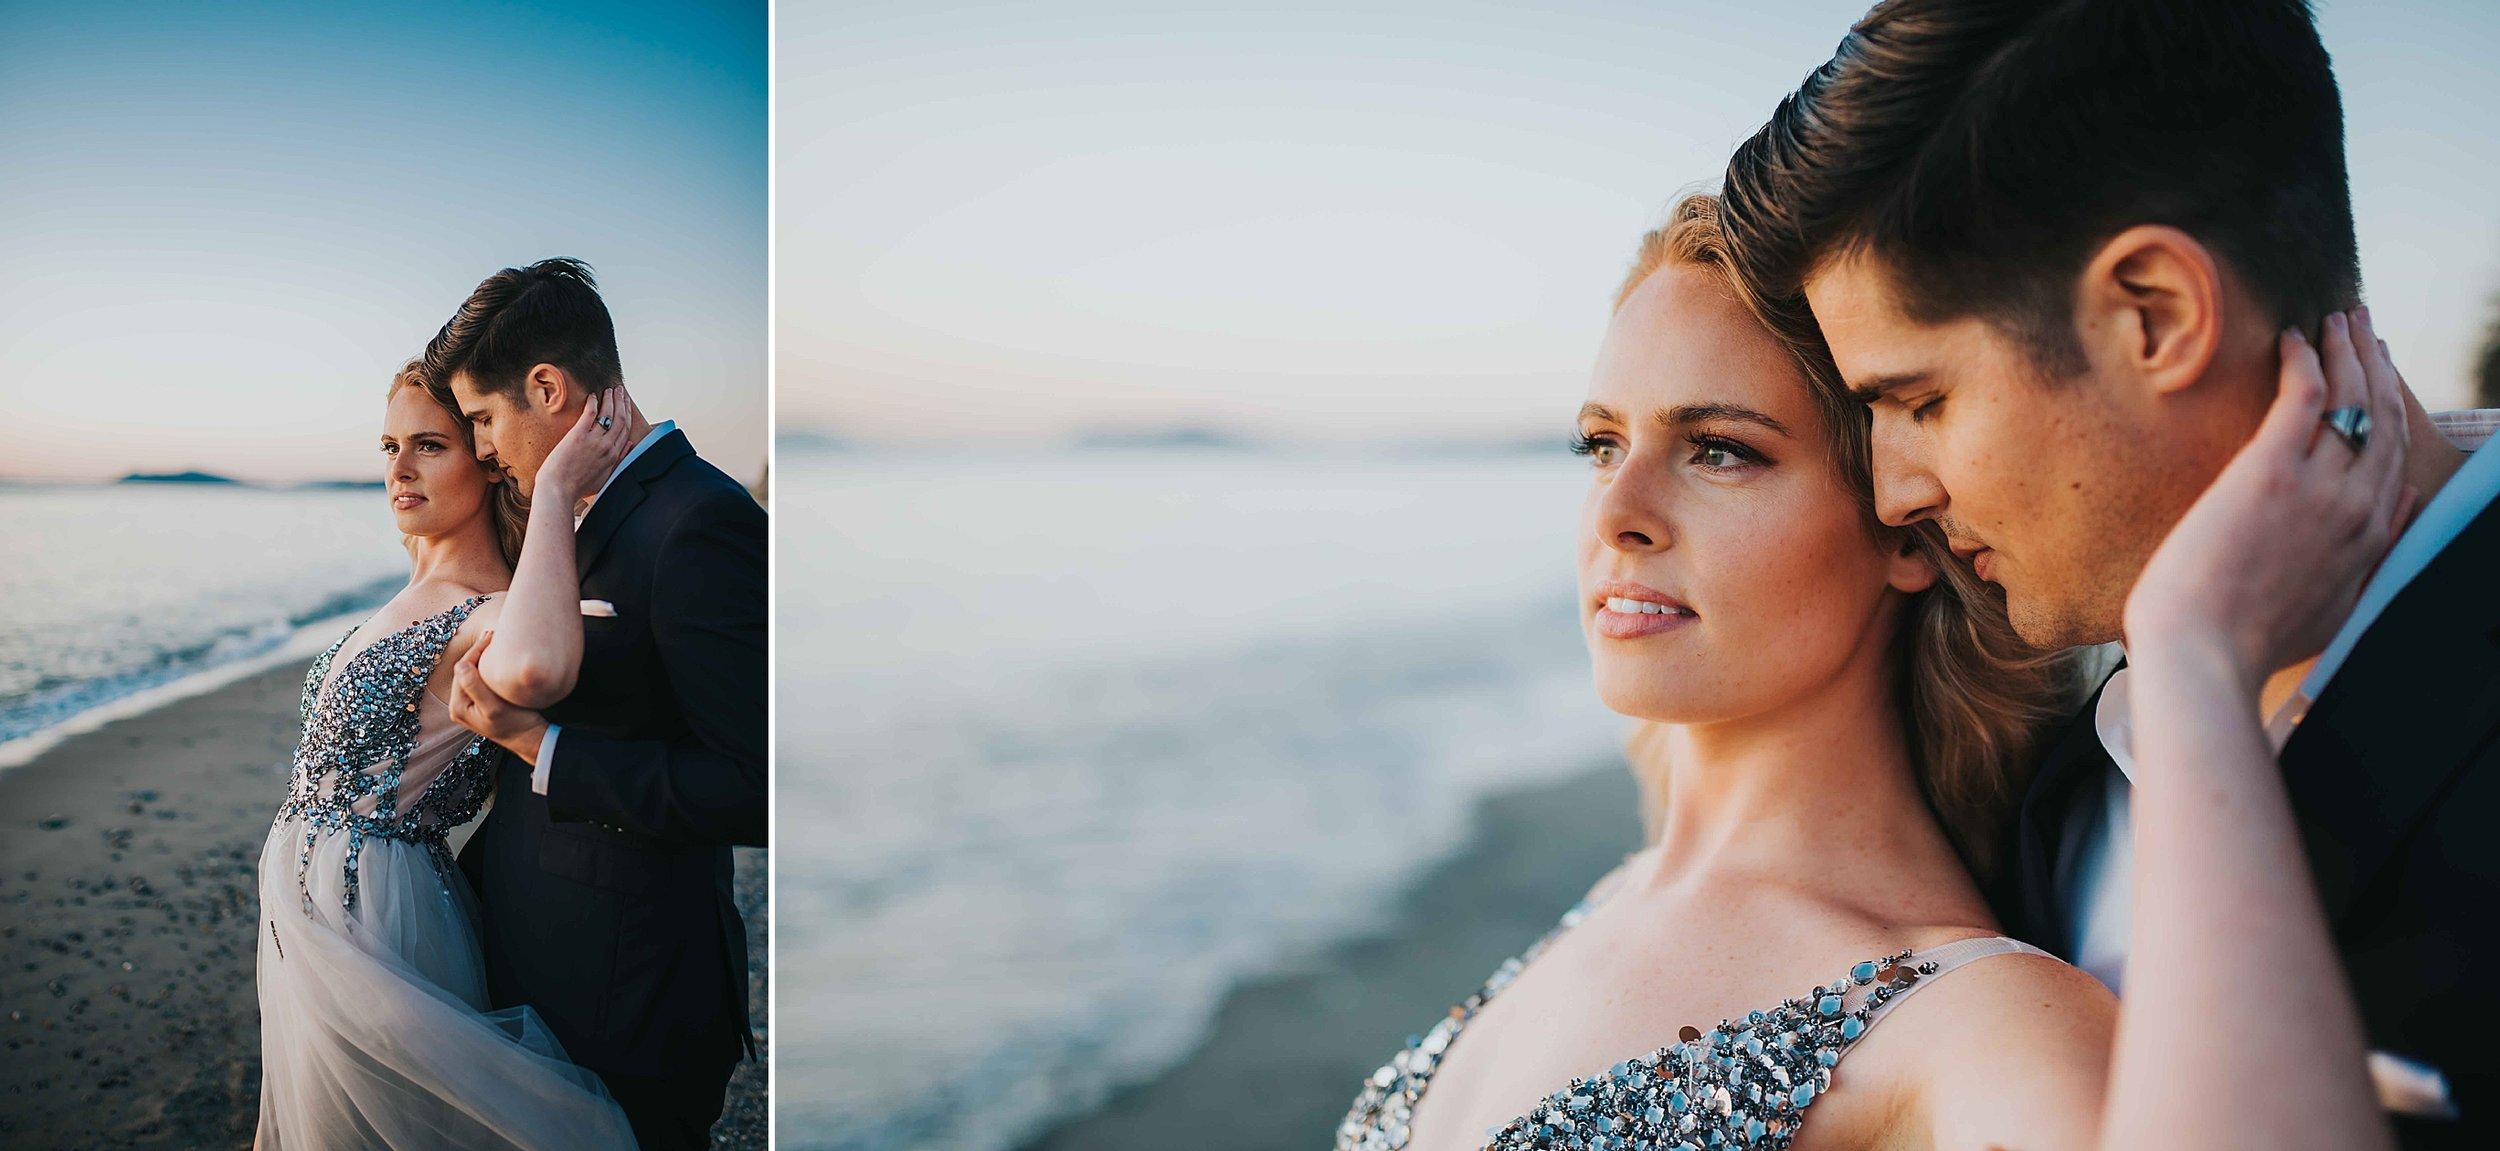 WM-Wedding-photographer-J HODGES PHOTOGRAPHY_0278.jpg